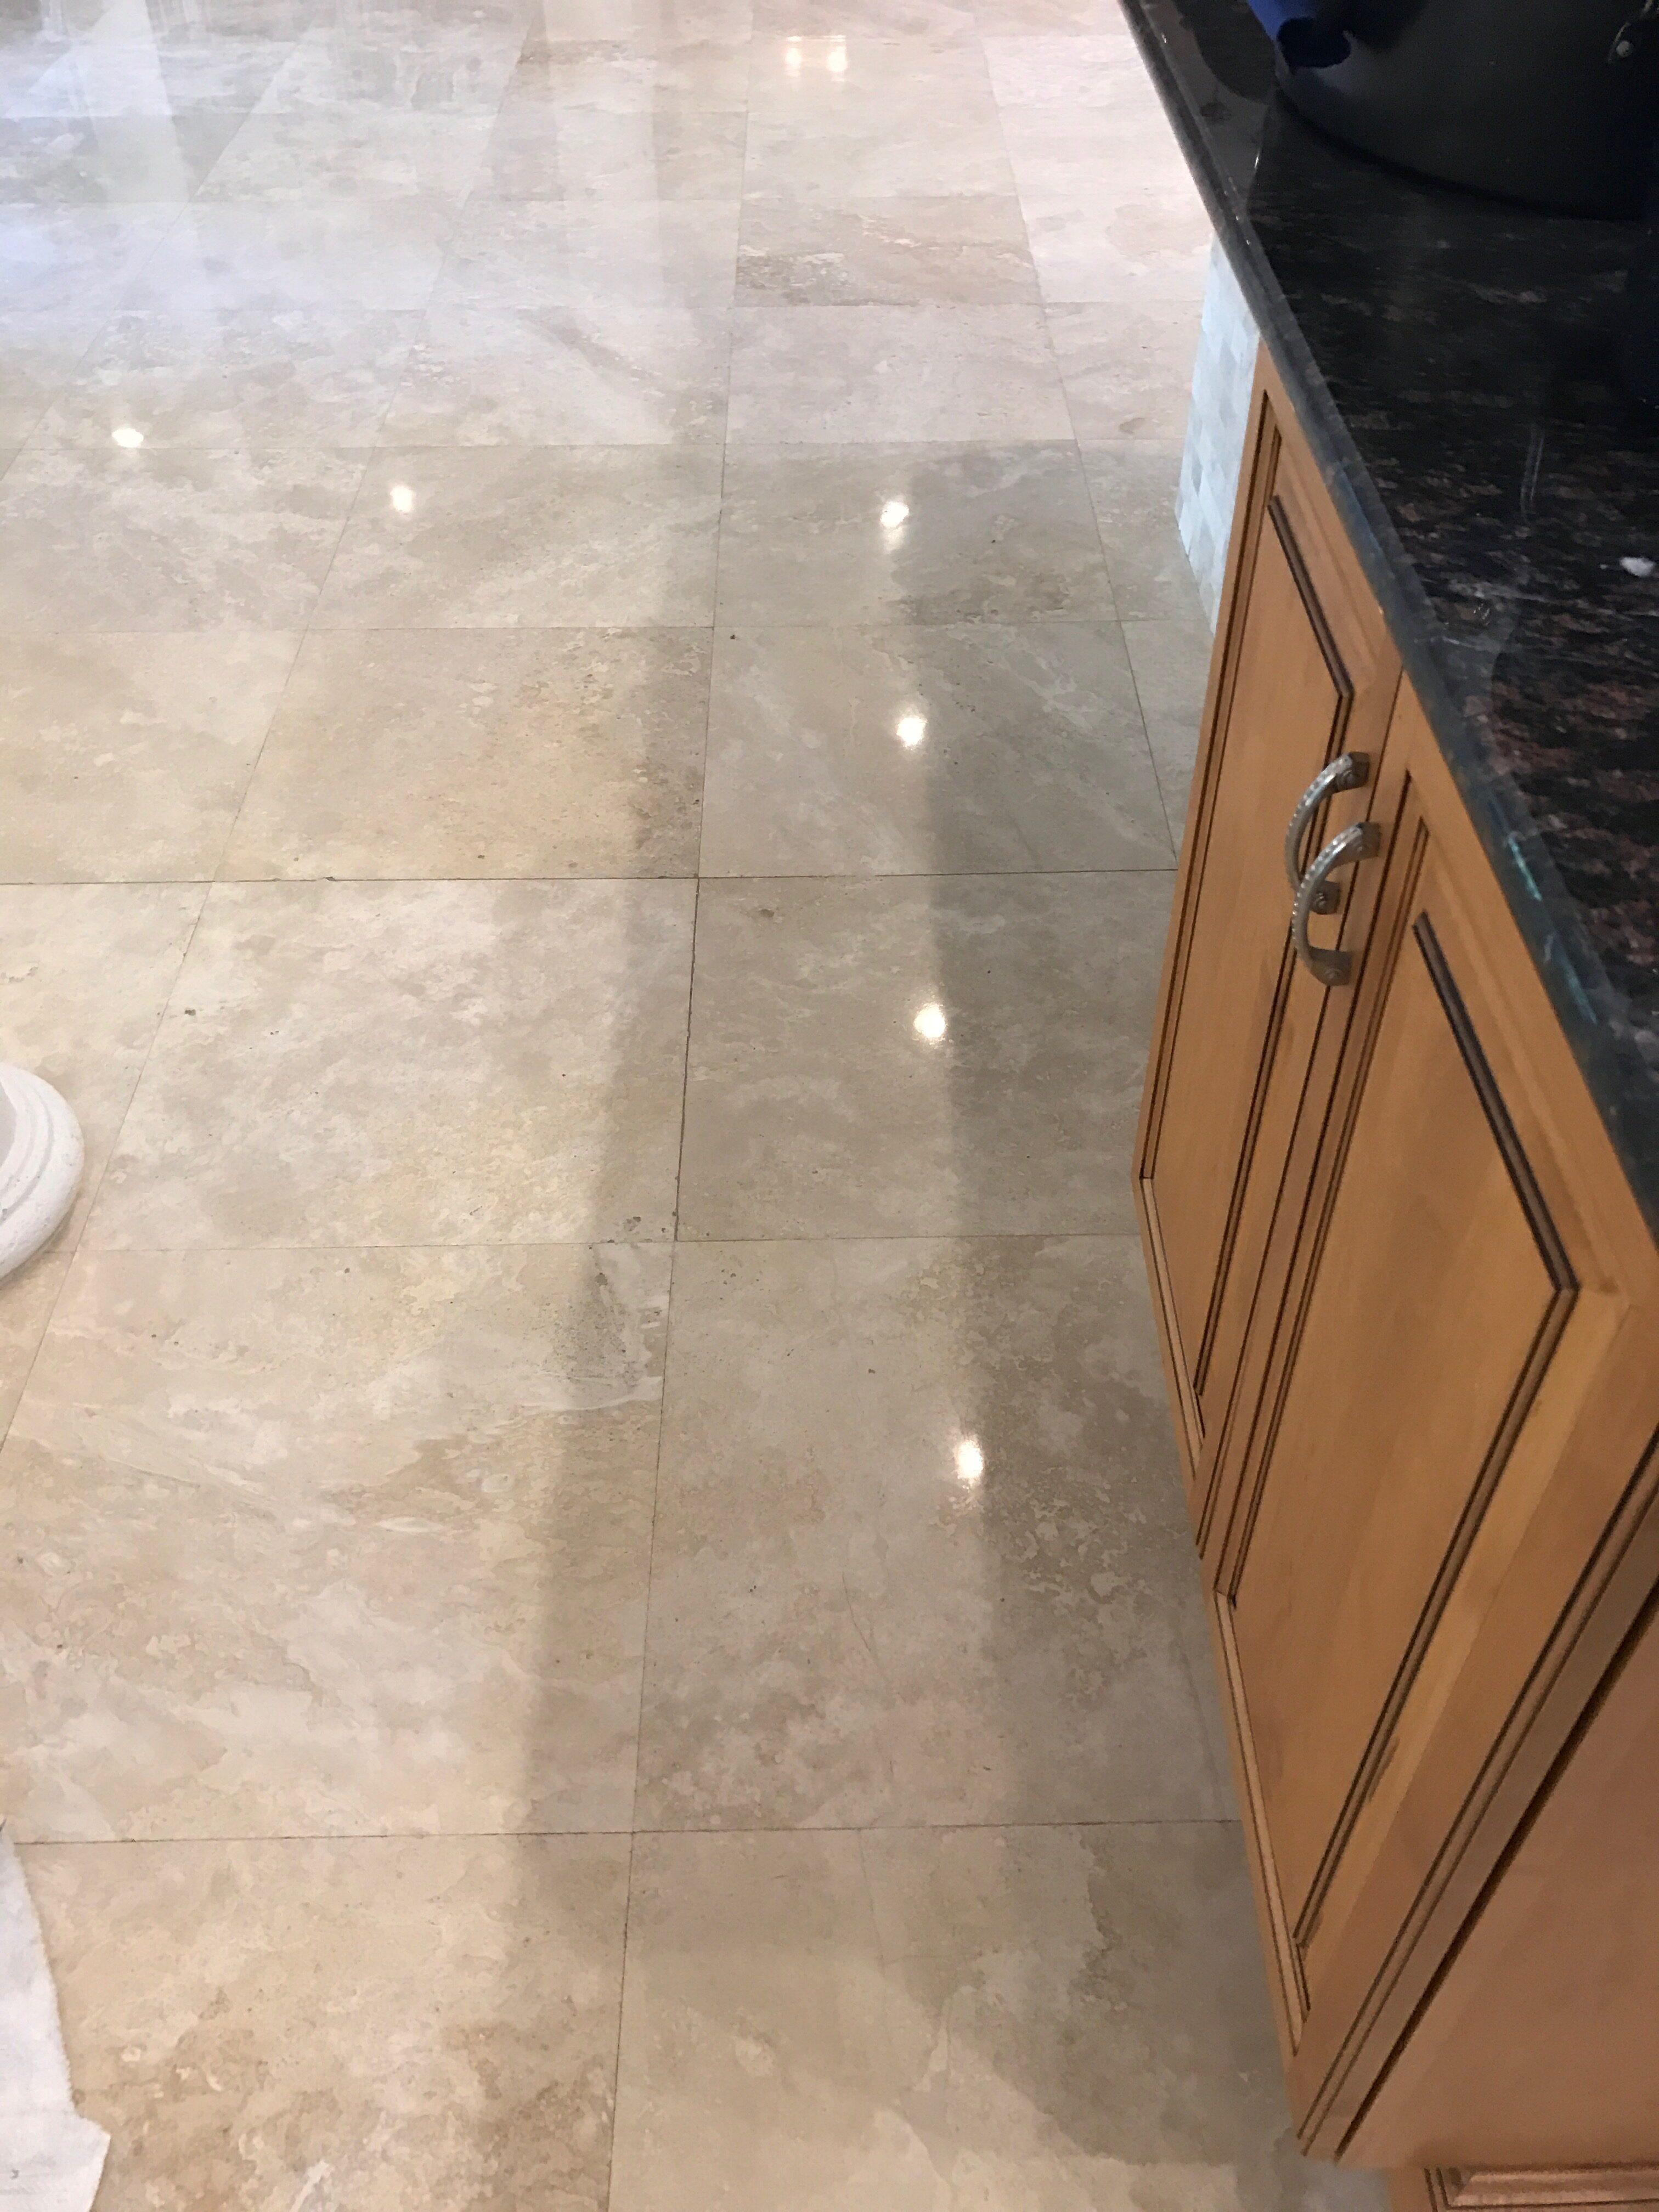 Travertine Cracked Stone Tiles Clean Image Of Orlando